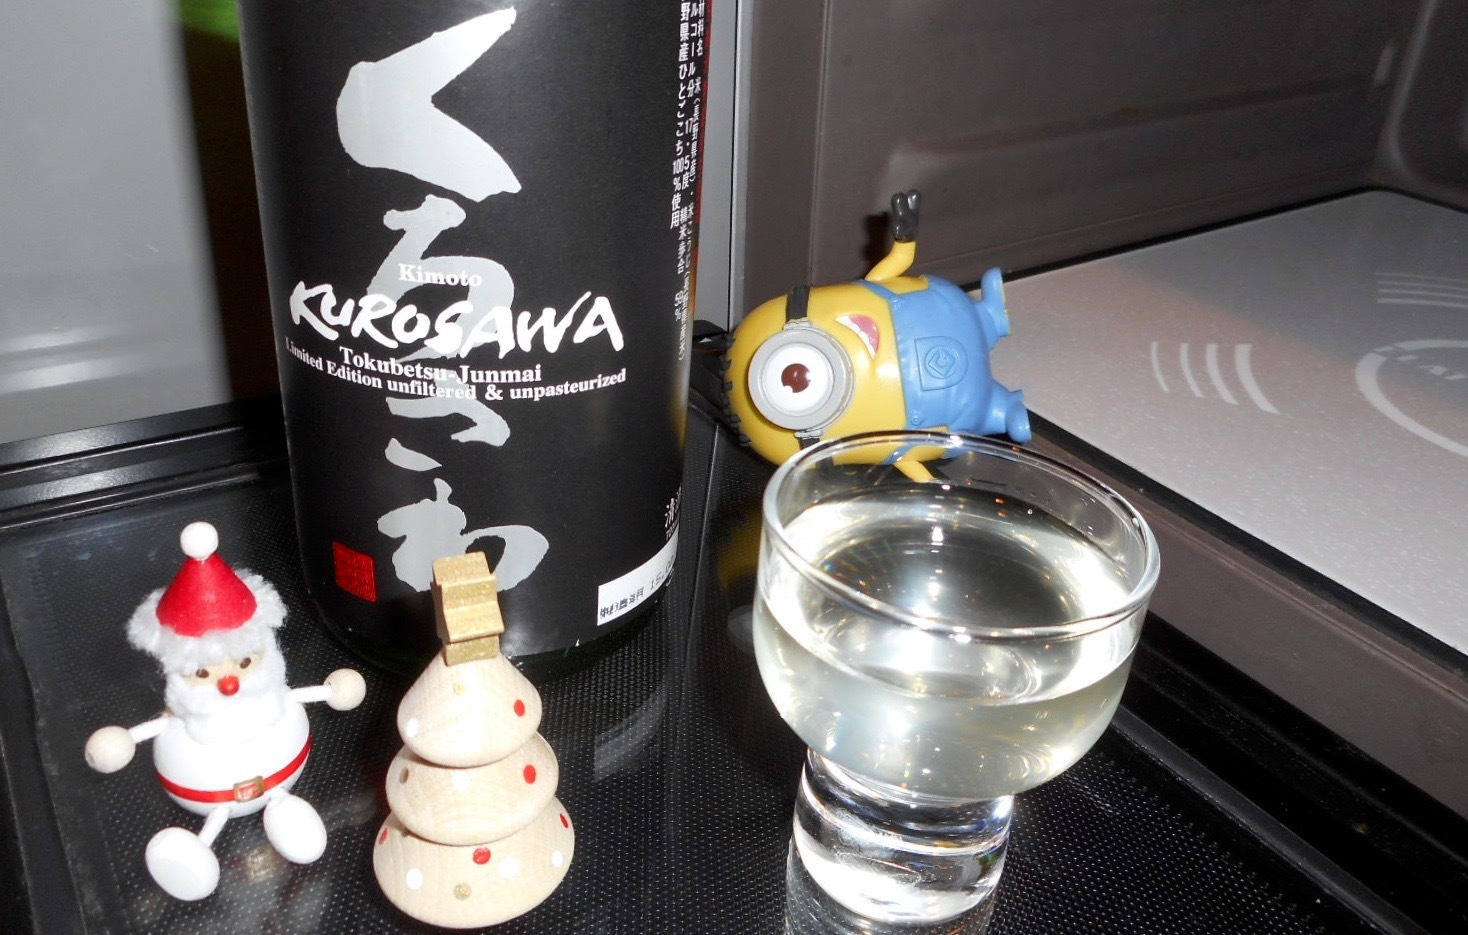 kurosawa_tokujun26by6.jpg